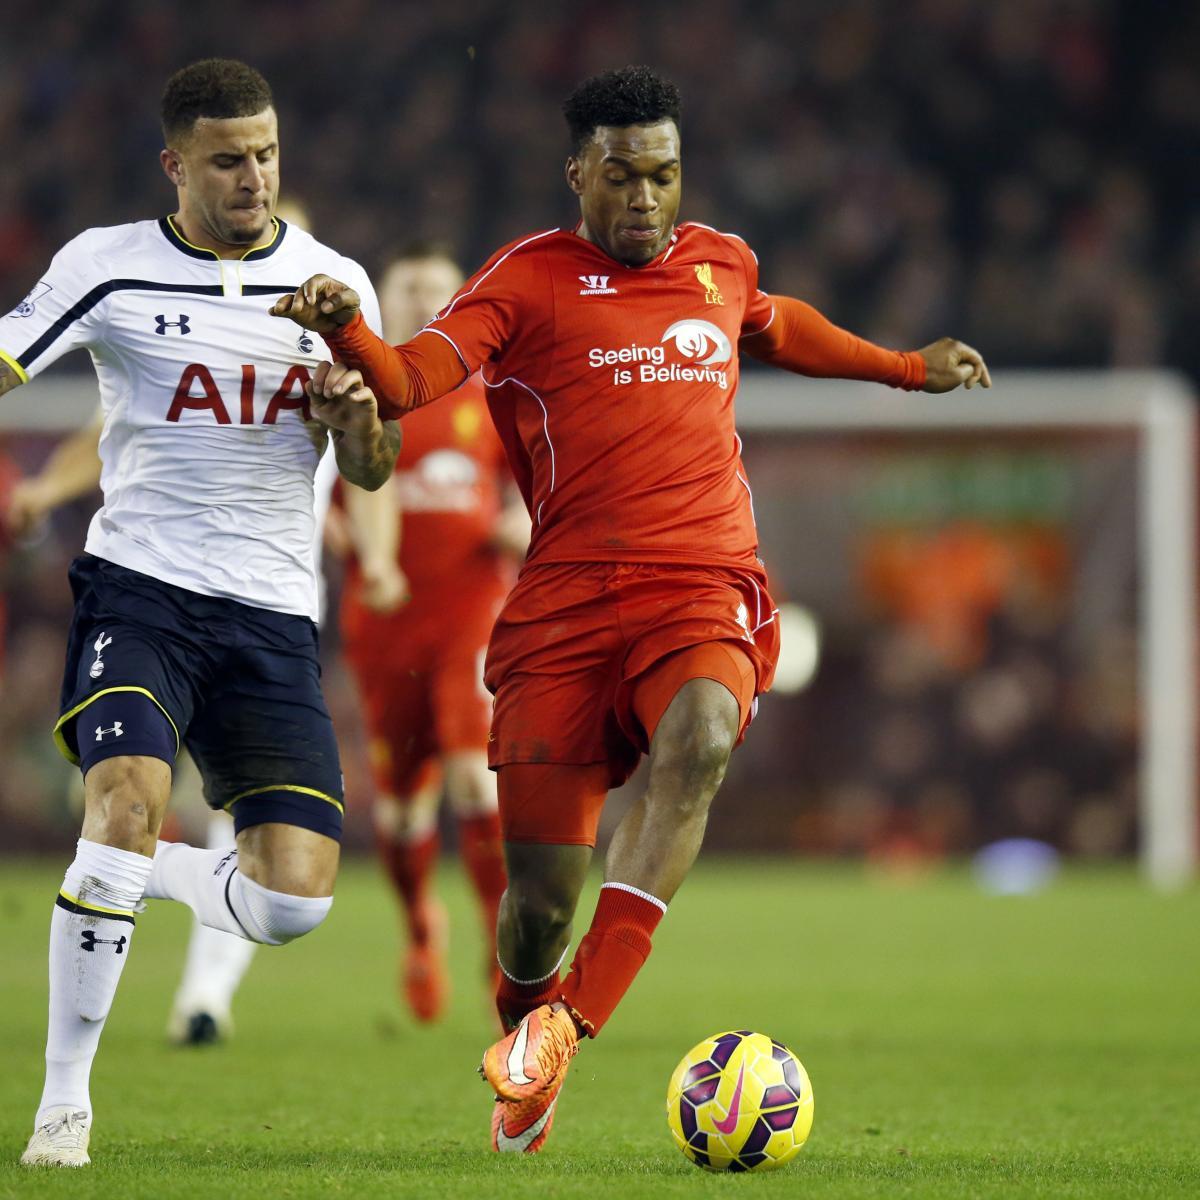 Live Streaming Soccer News Liverpool Vs Benfica Live: Tottenham Vs. Liverpool: Team News, Predicted Lineups